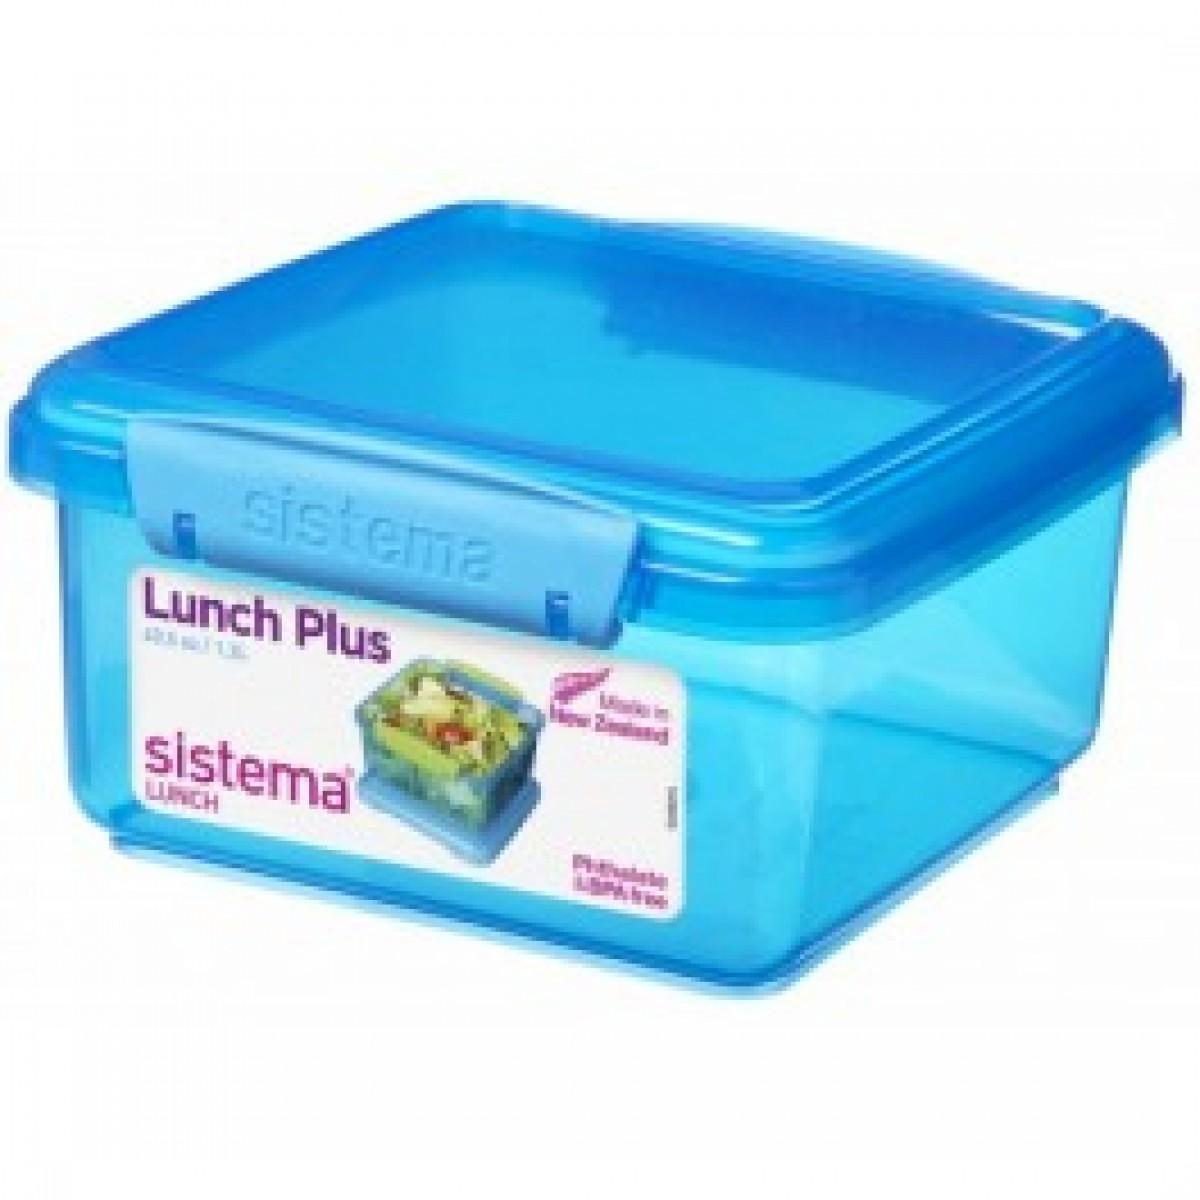 SISTEMA Madkasse lunch plus blå 1,2 ltr.